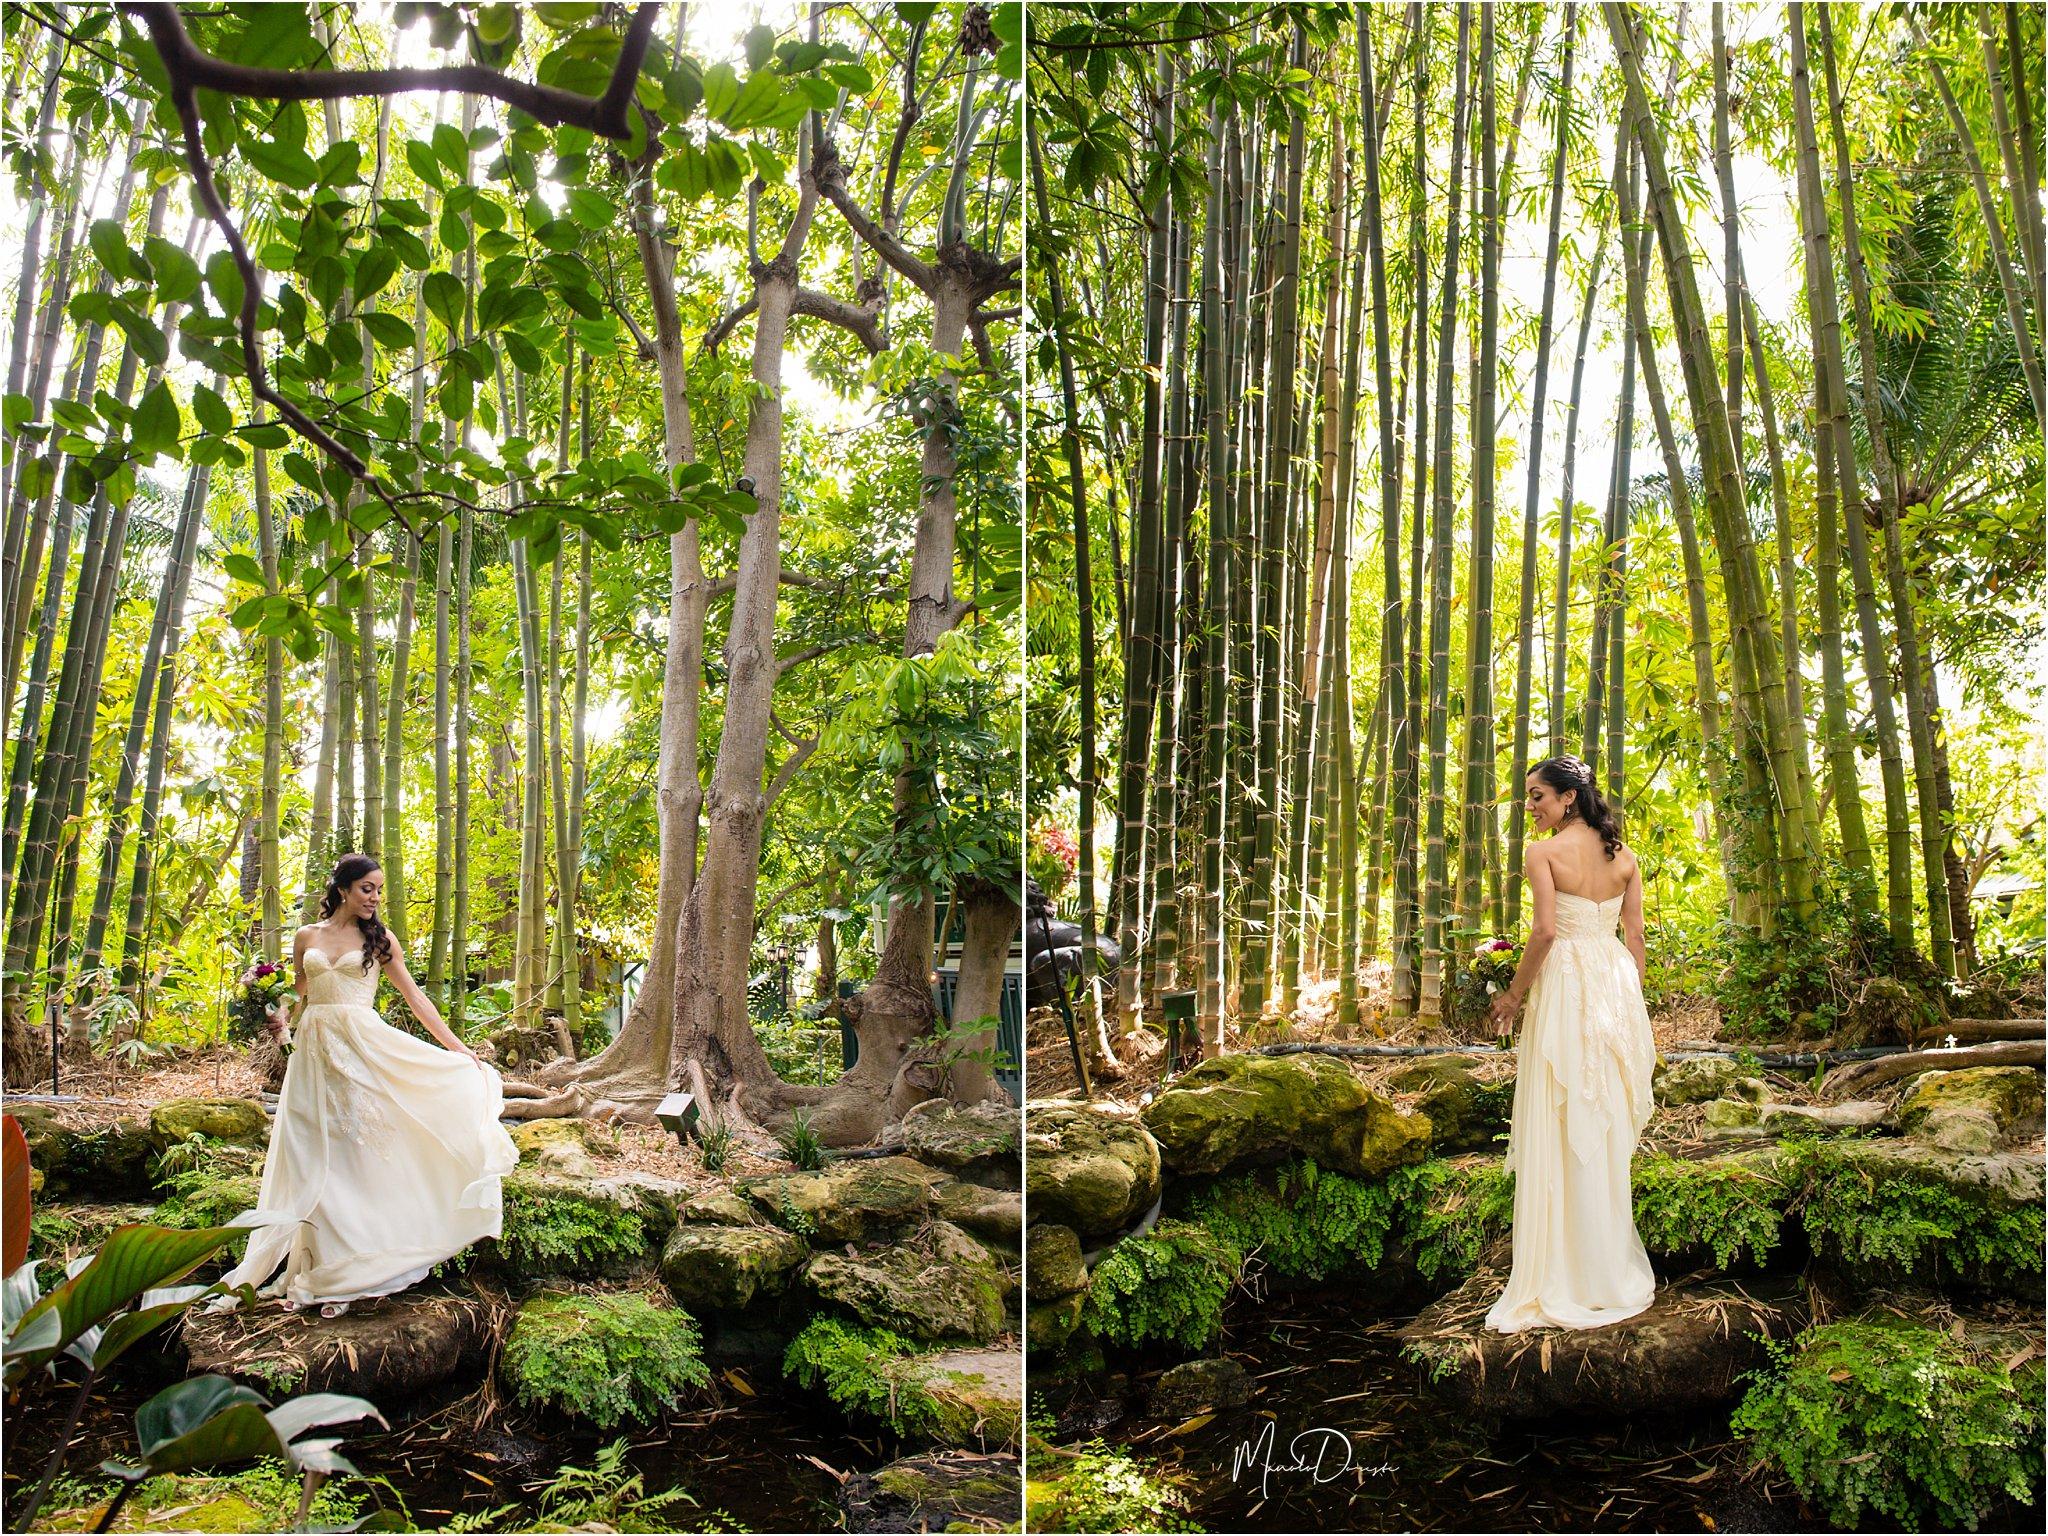 0503_ManoloDoreste_InFocusStudios_Wedding_Family_Photography_Miami_MiamiPhotographer.jpg